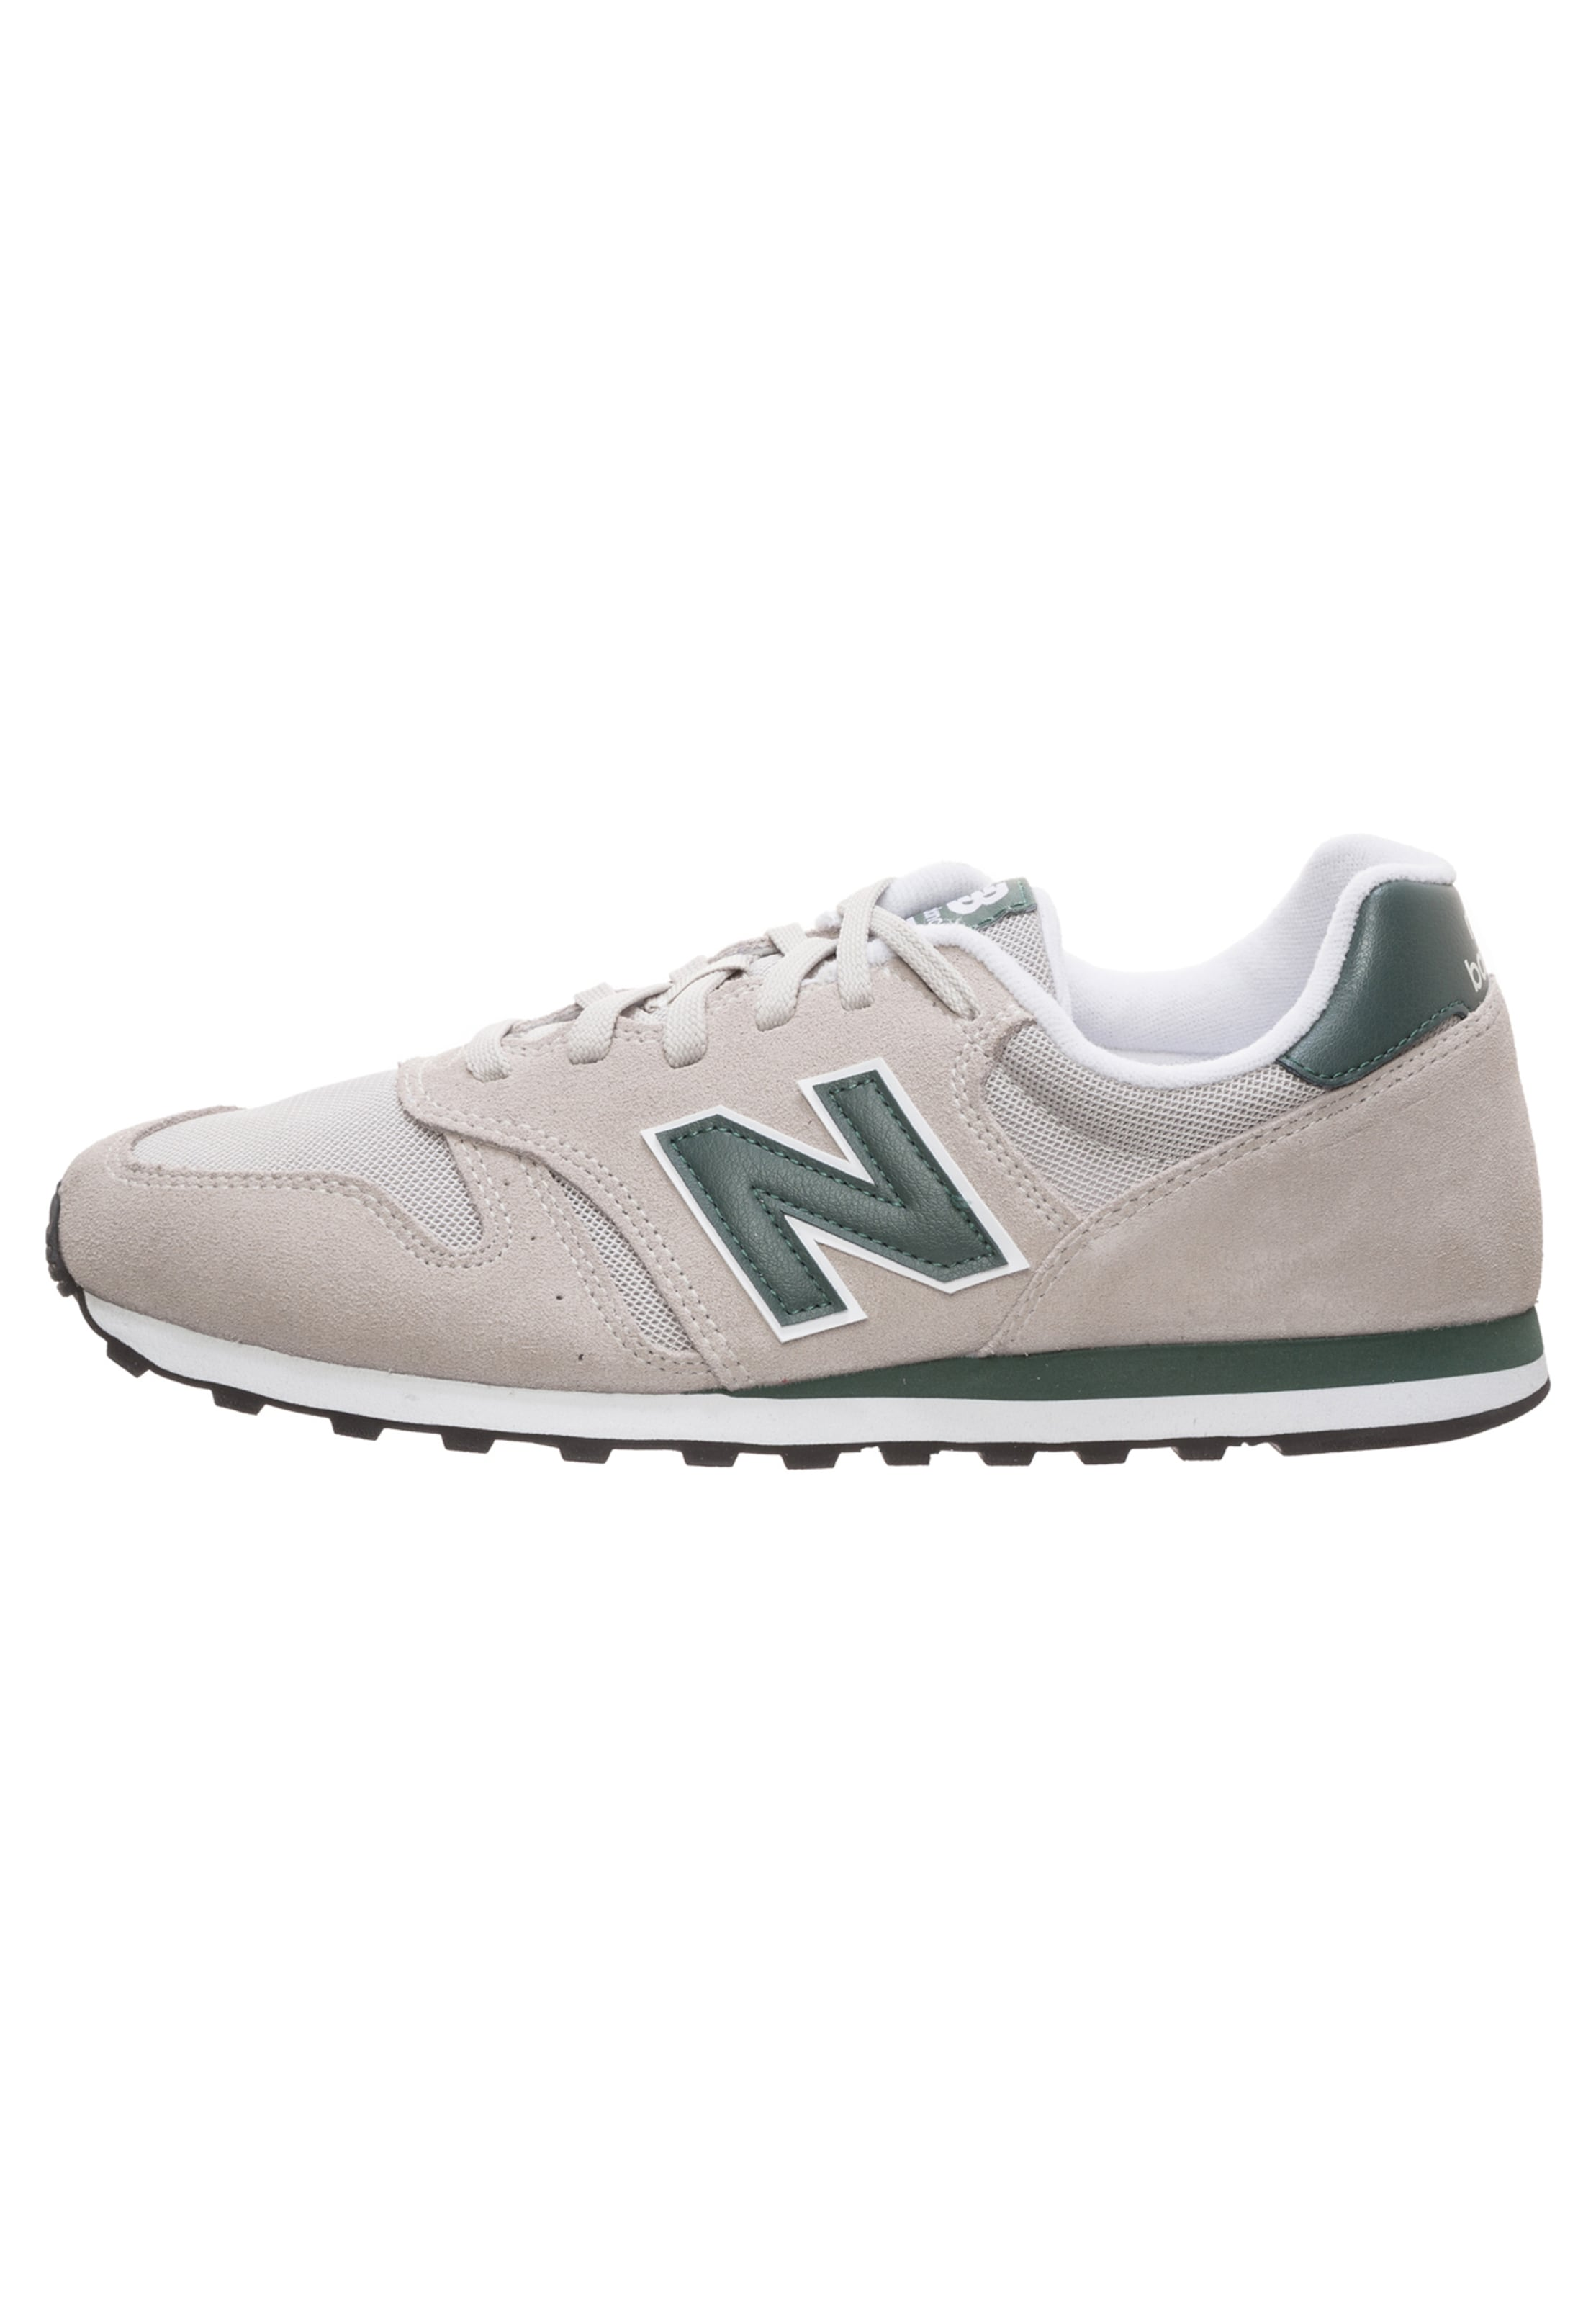 New In NudeBasaltgrau Balance 'ml Sneaker 373' Weiß roedxBQCW